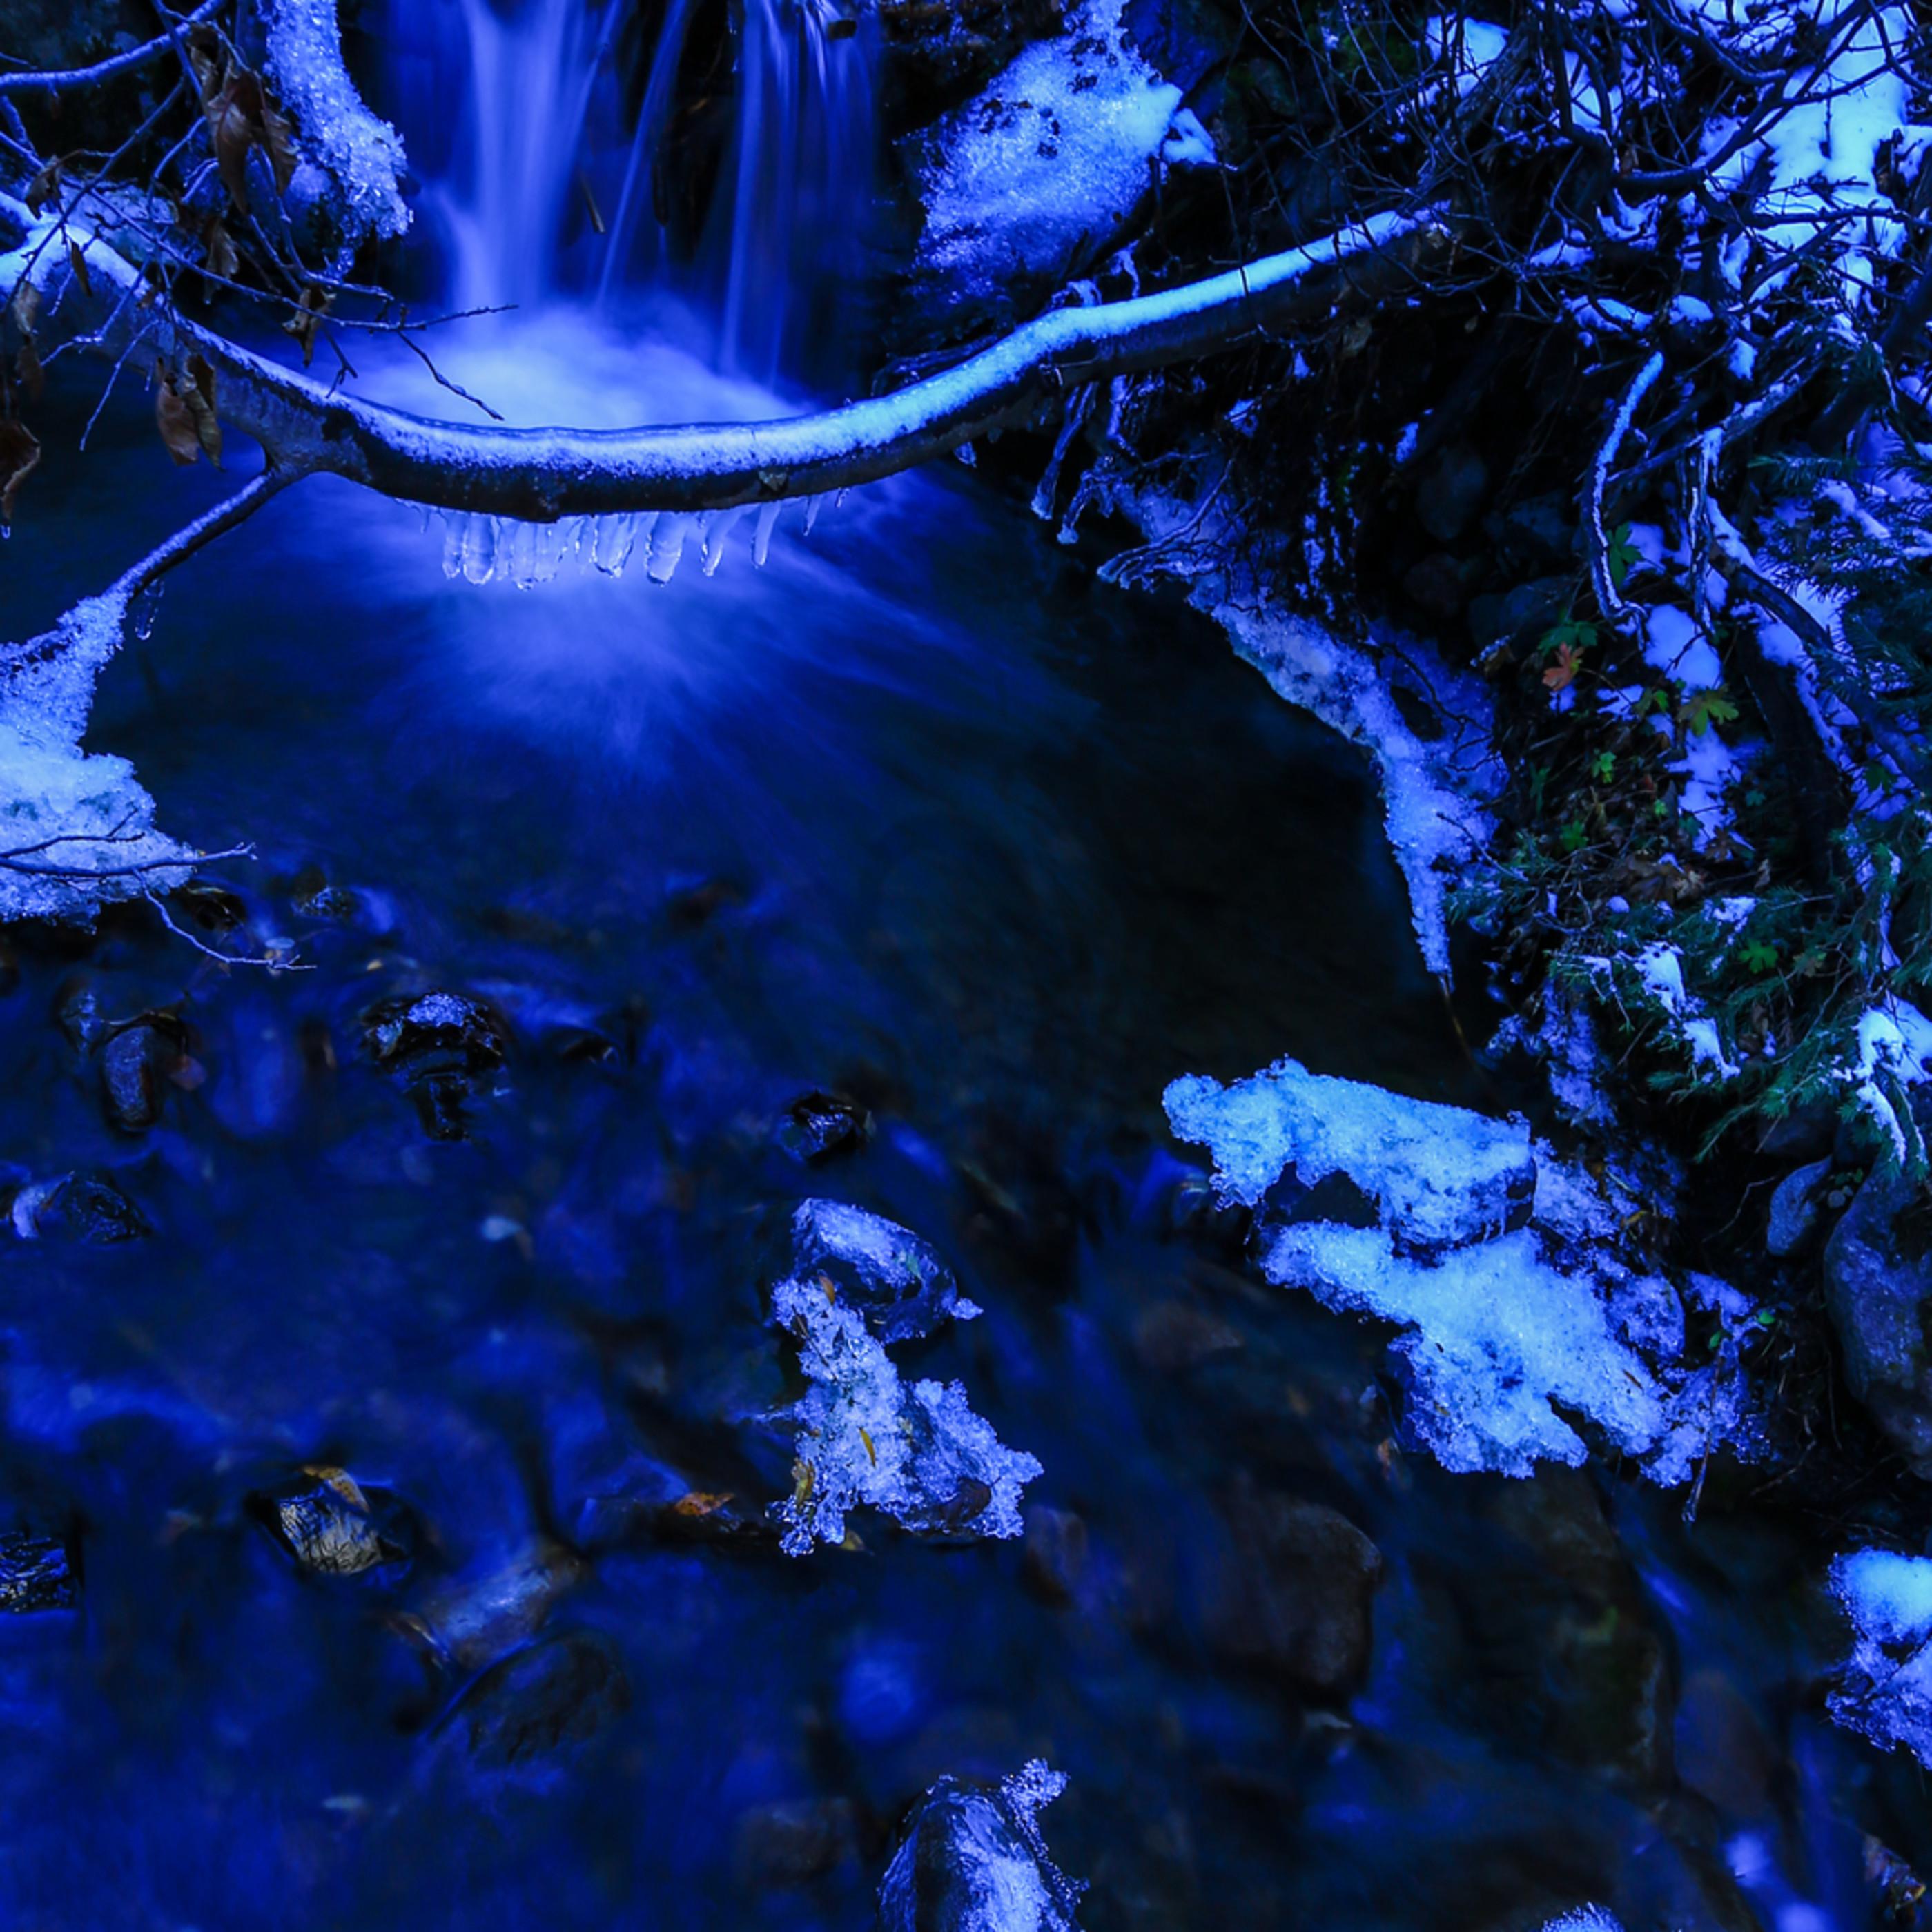 Winter falls sygvke